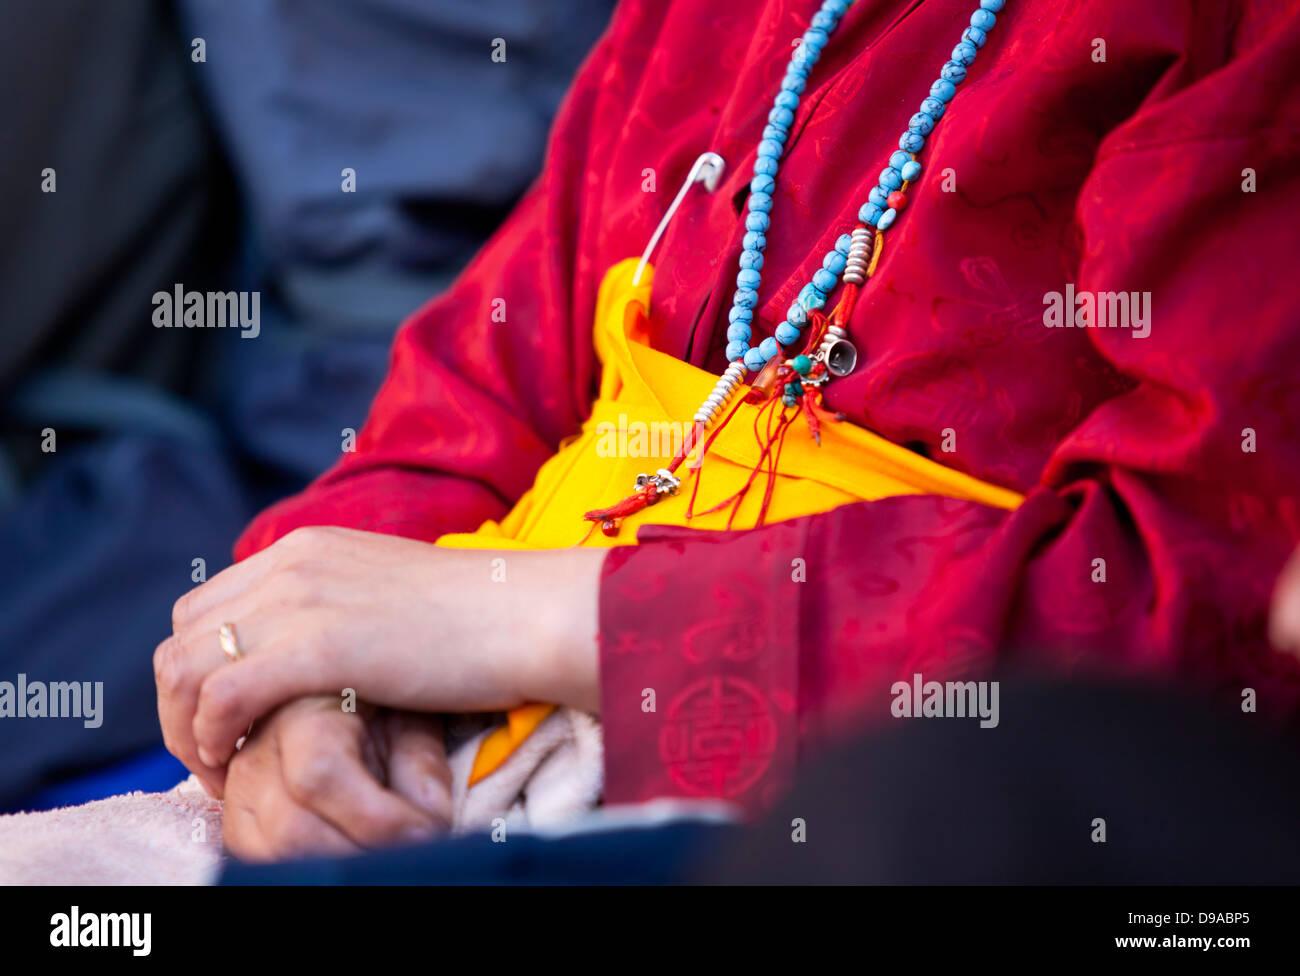 Tibet prayer with Buddhist beads - Stock Image